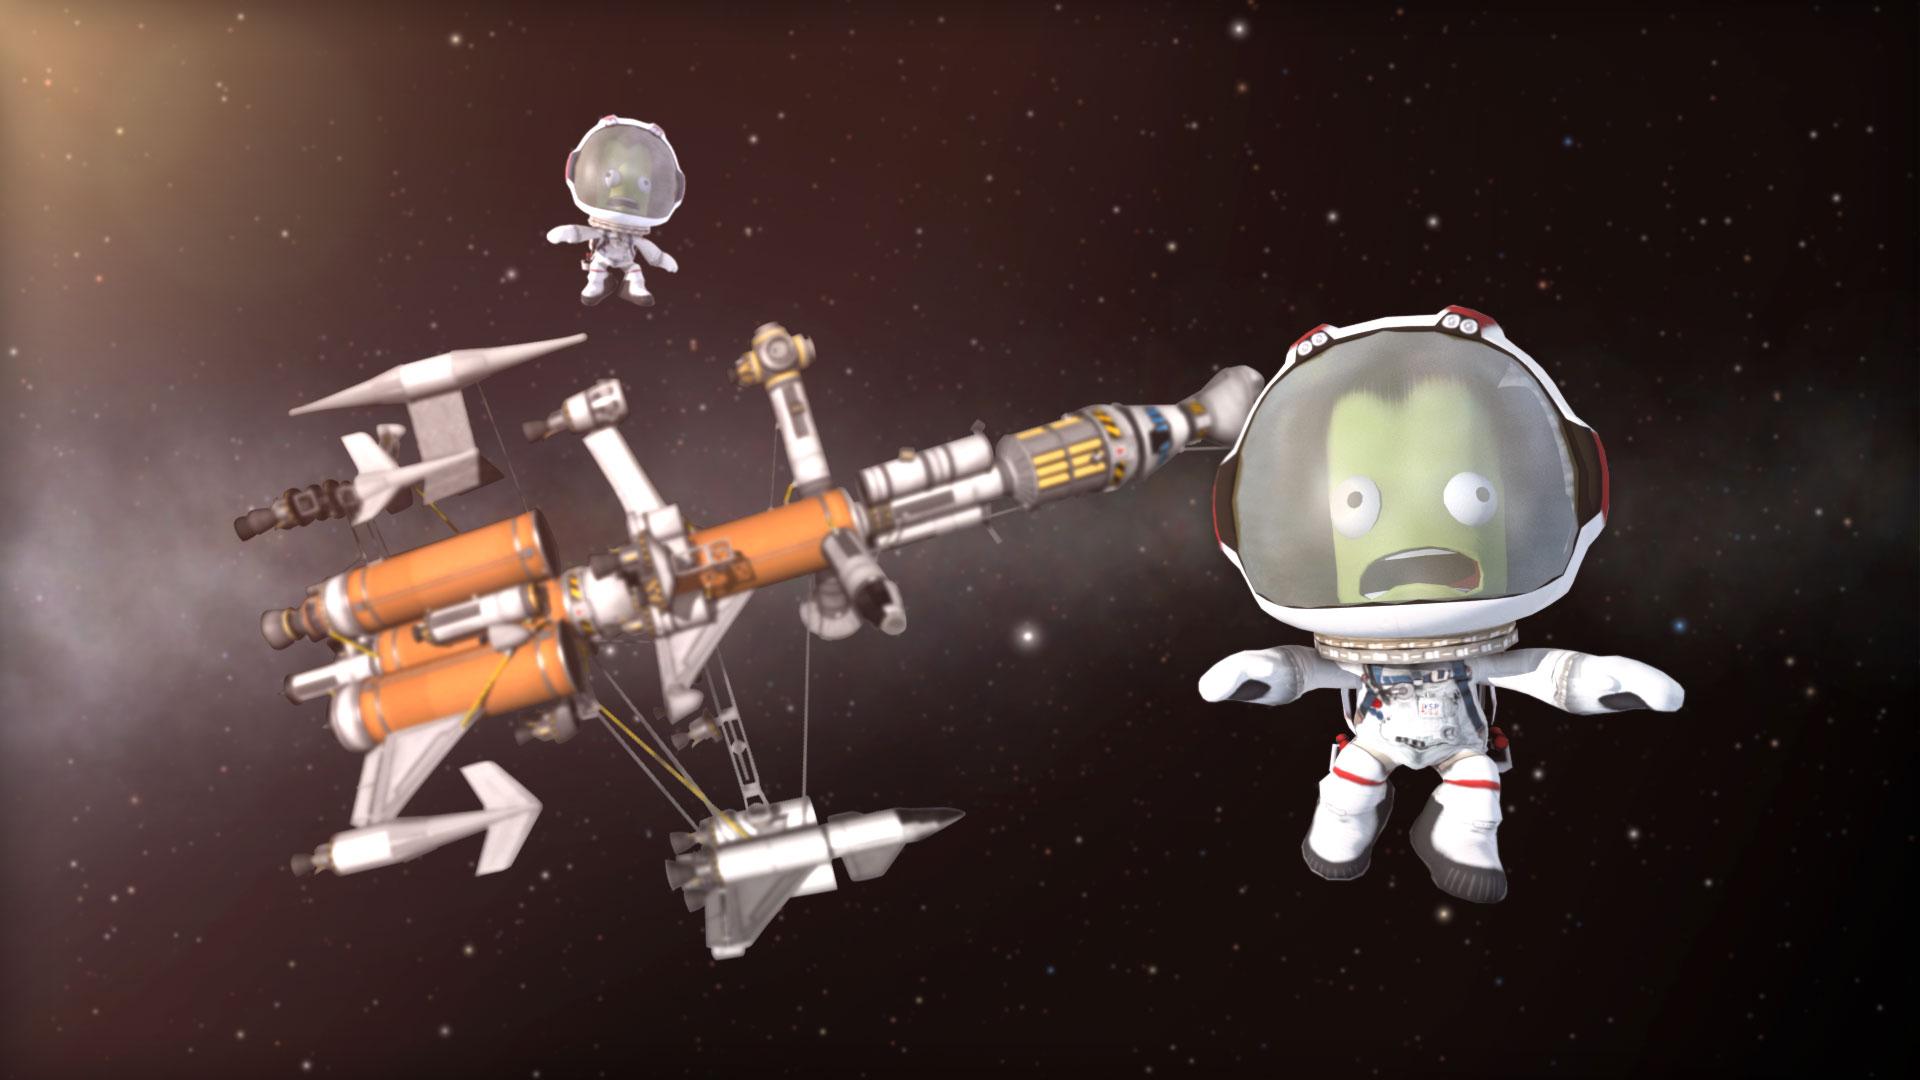 """Mission Control, we have a problem."" Credit: Squad, Monkey Squad S.A de C.V."